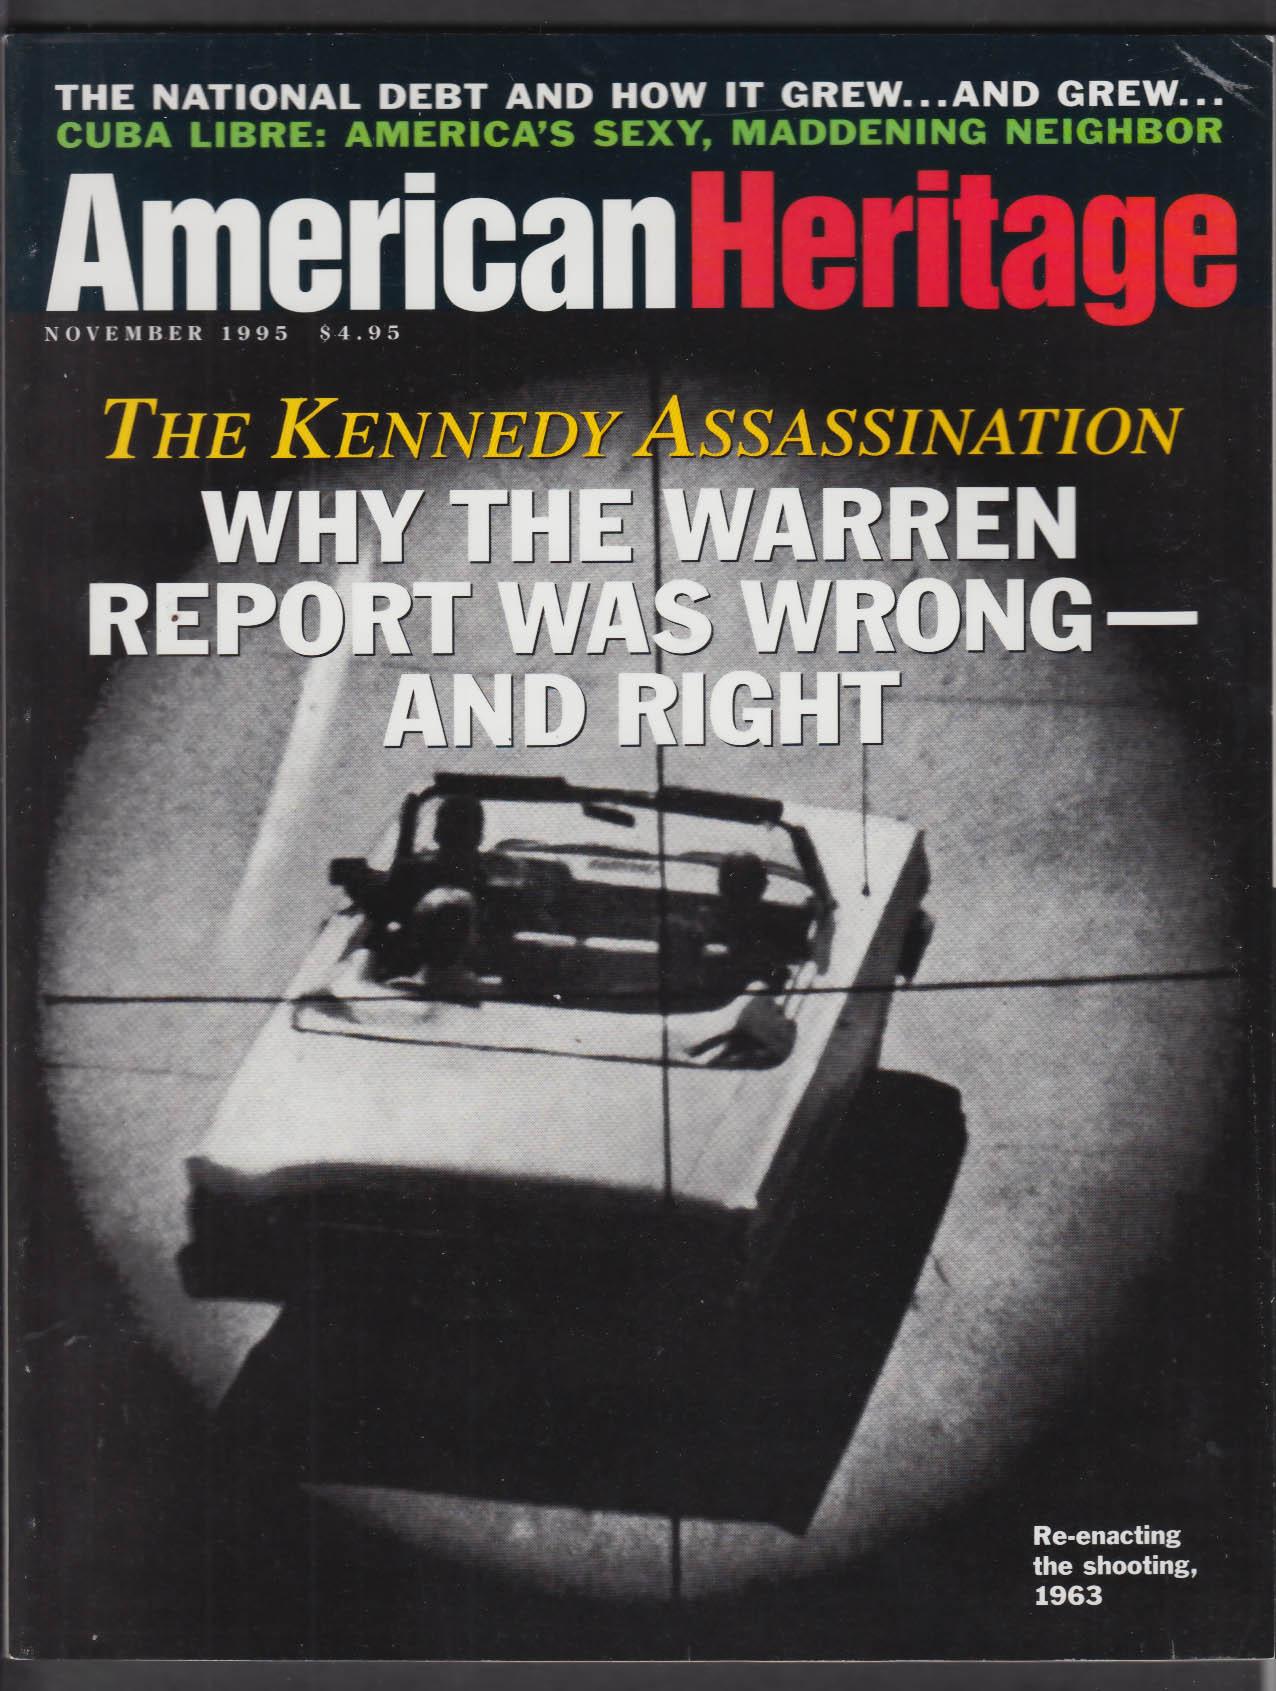 AMERICAN HERITAGE Kennedy Assassination Federal Debt San Patricios Cuba 11 1995